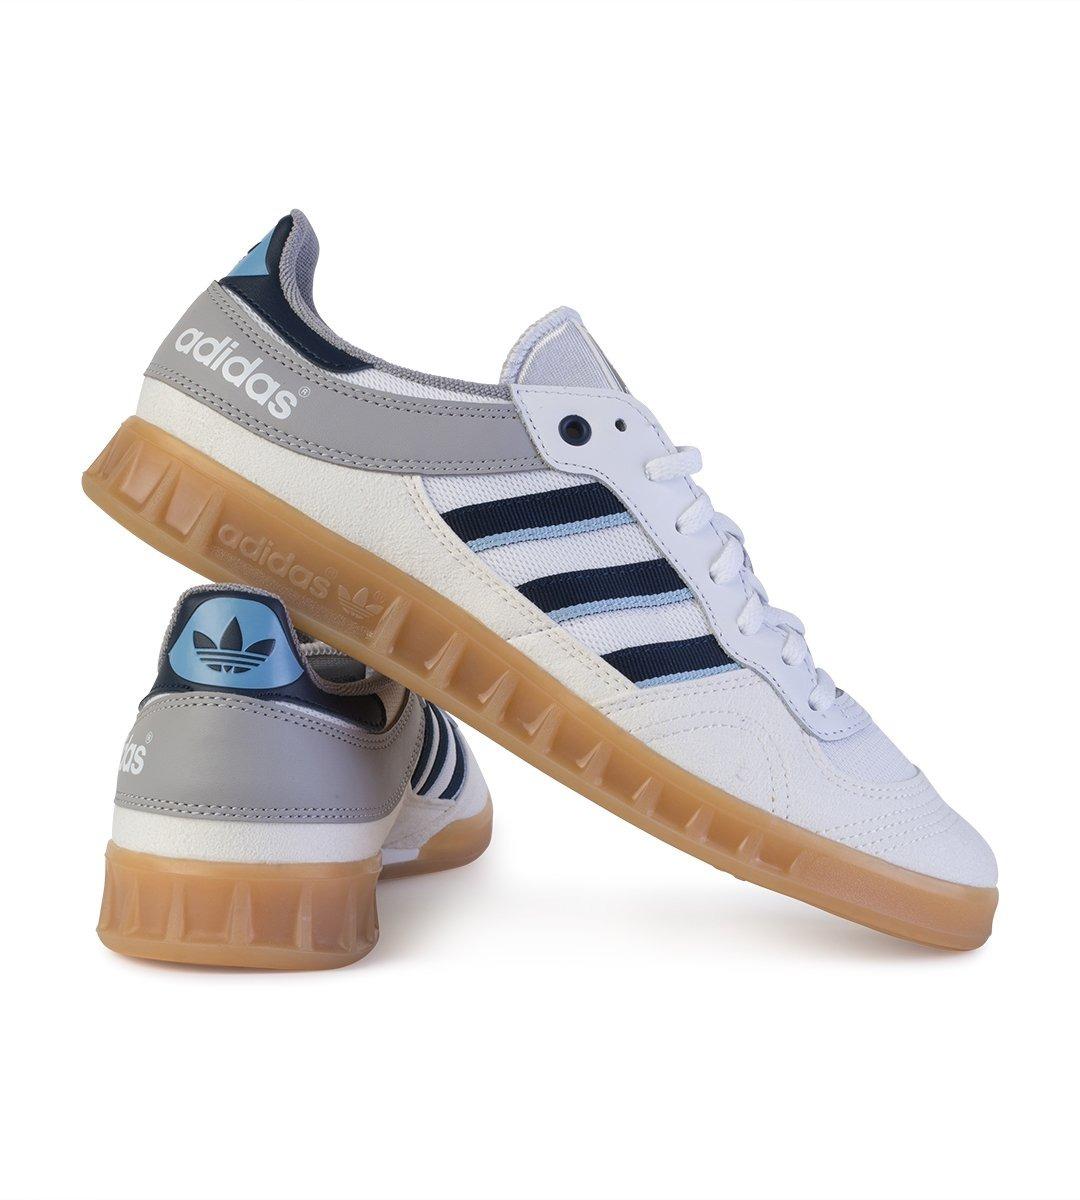 reputable site bedc4 ecf86 tenis adidas originals liga skateboarding. Cargando zoom.